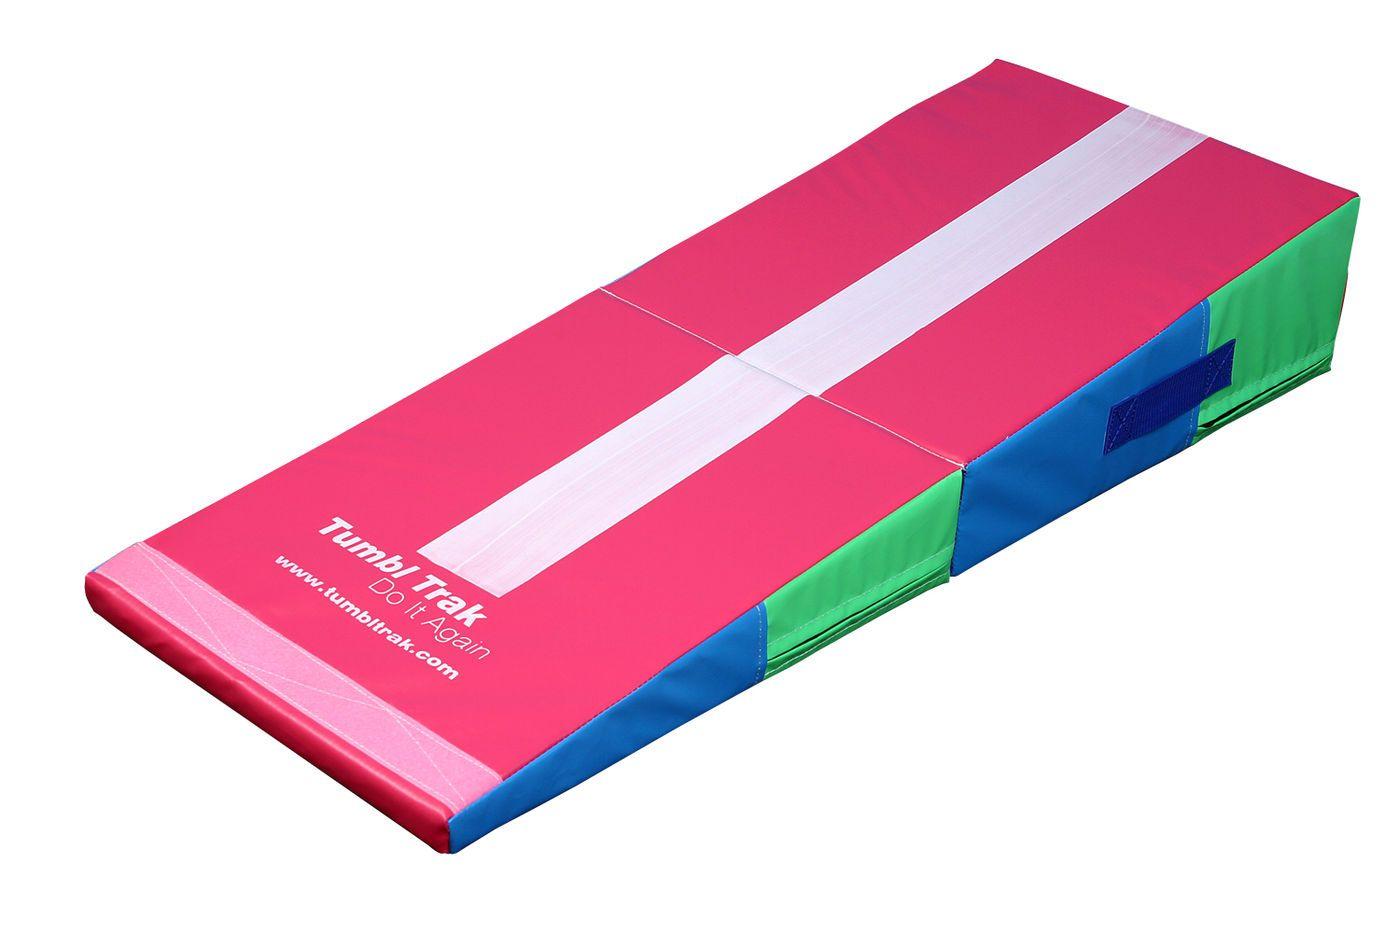 canada mat wedge sell we dp and amazon cheese folding tumbling skill shape gymnastics mats incline non